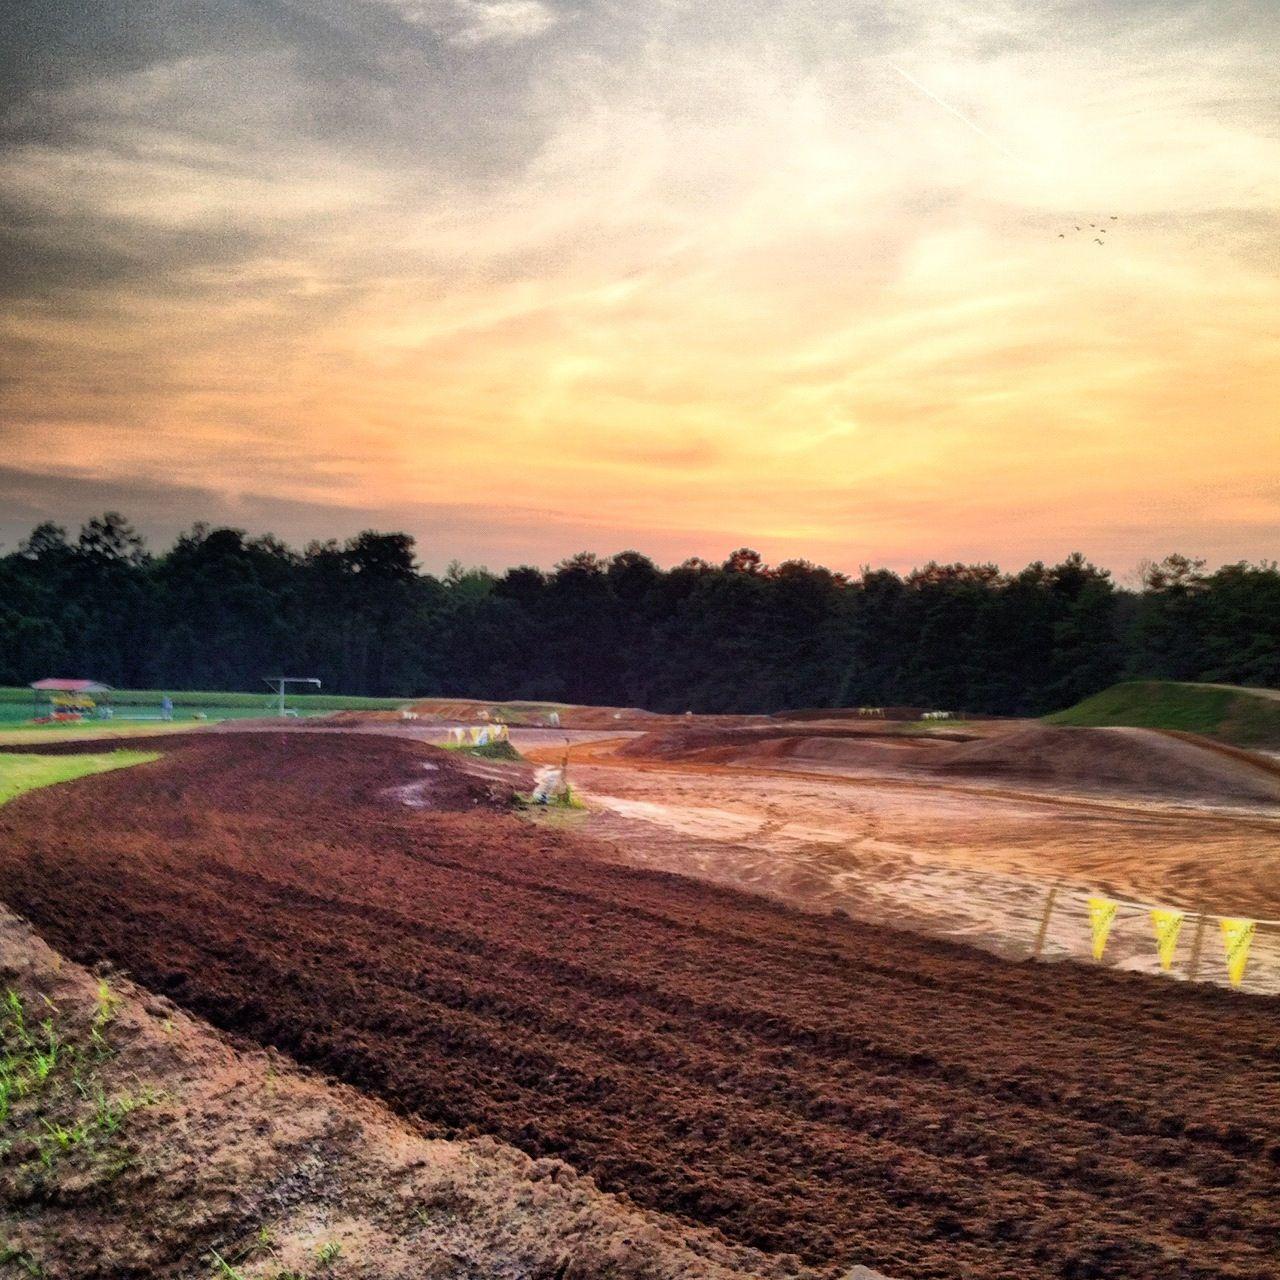 Sandway Motocross Track